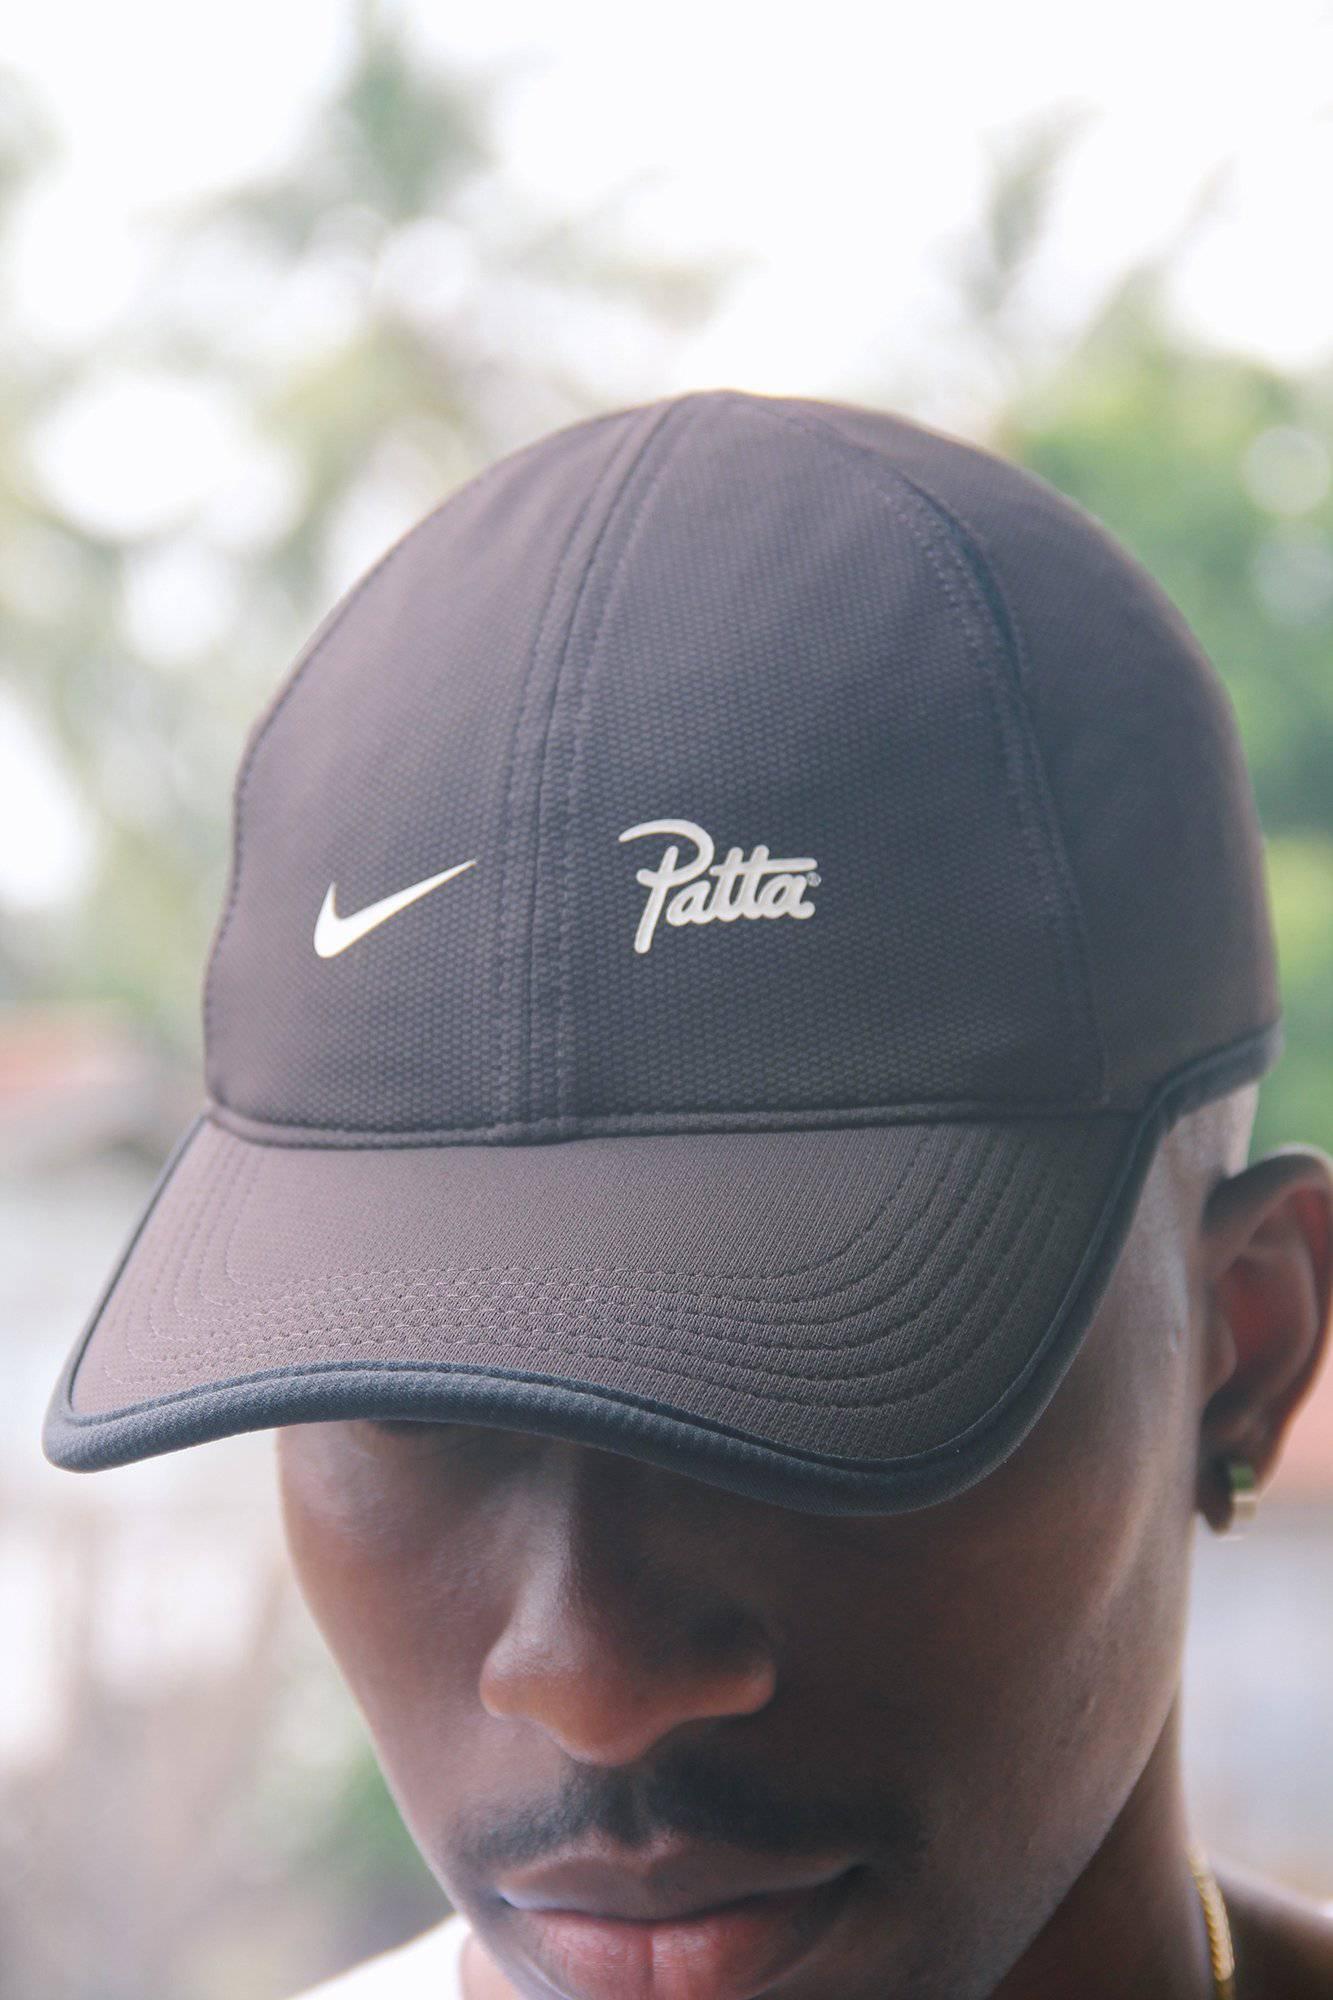 Stephen-Tayo-Nike-Patta-Publicity-Publicity